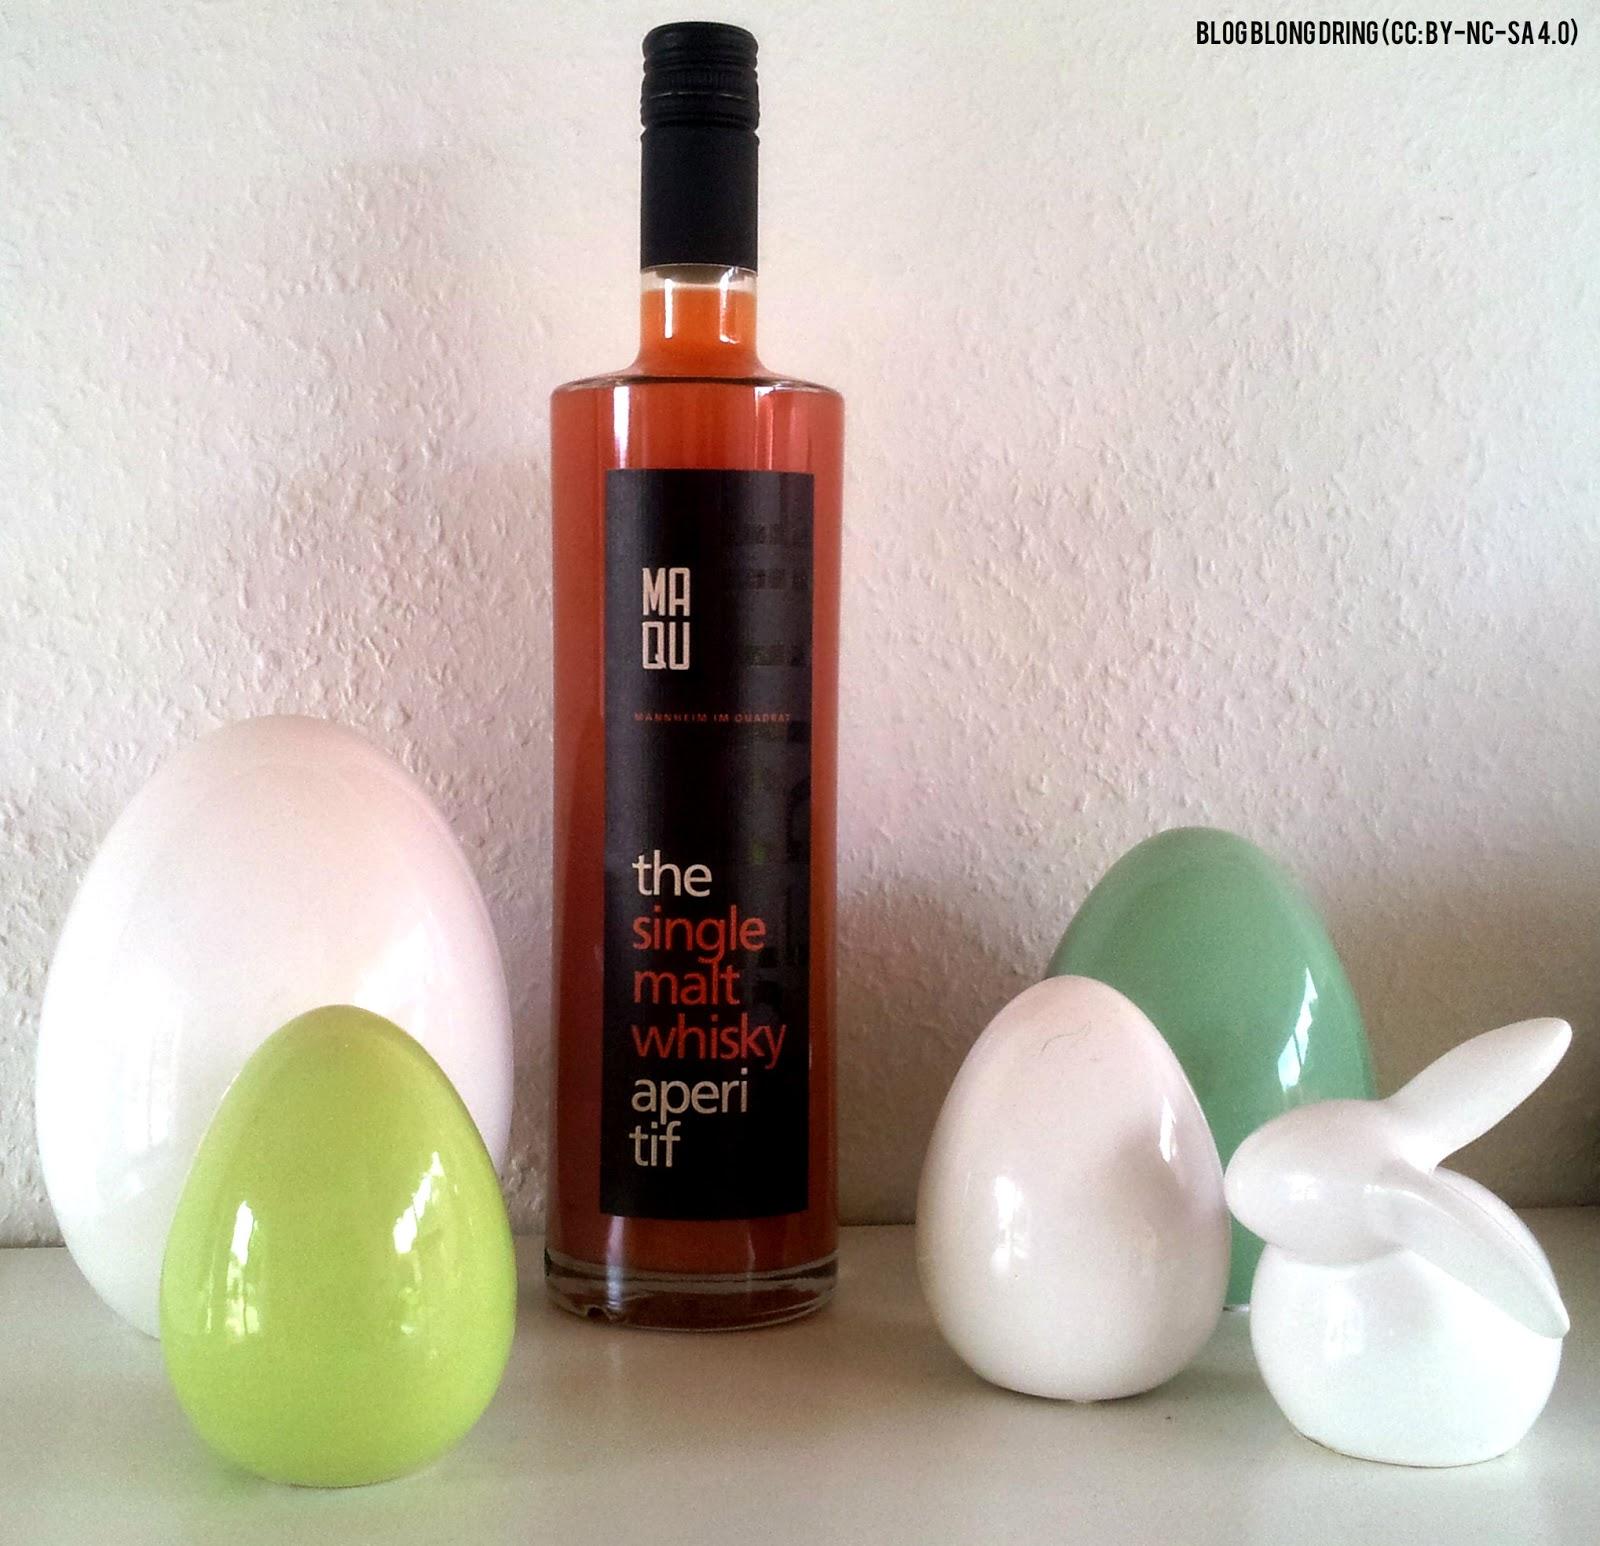 blog blong dring: MAQU - The Single Malt Whisky Aperitif (12% Vol.)